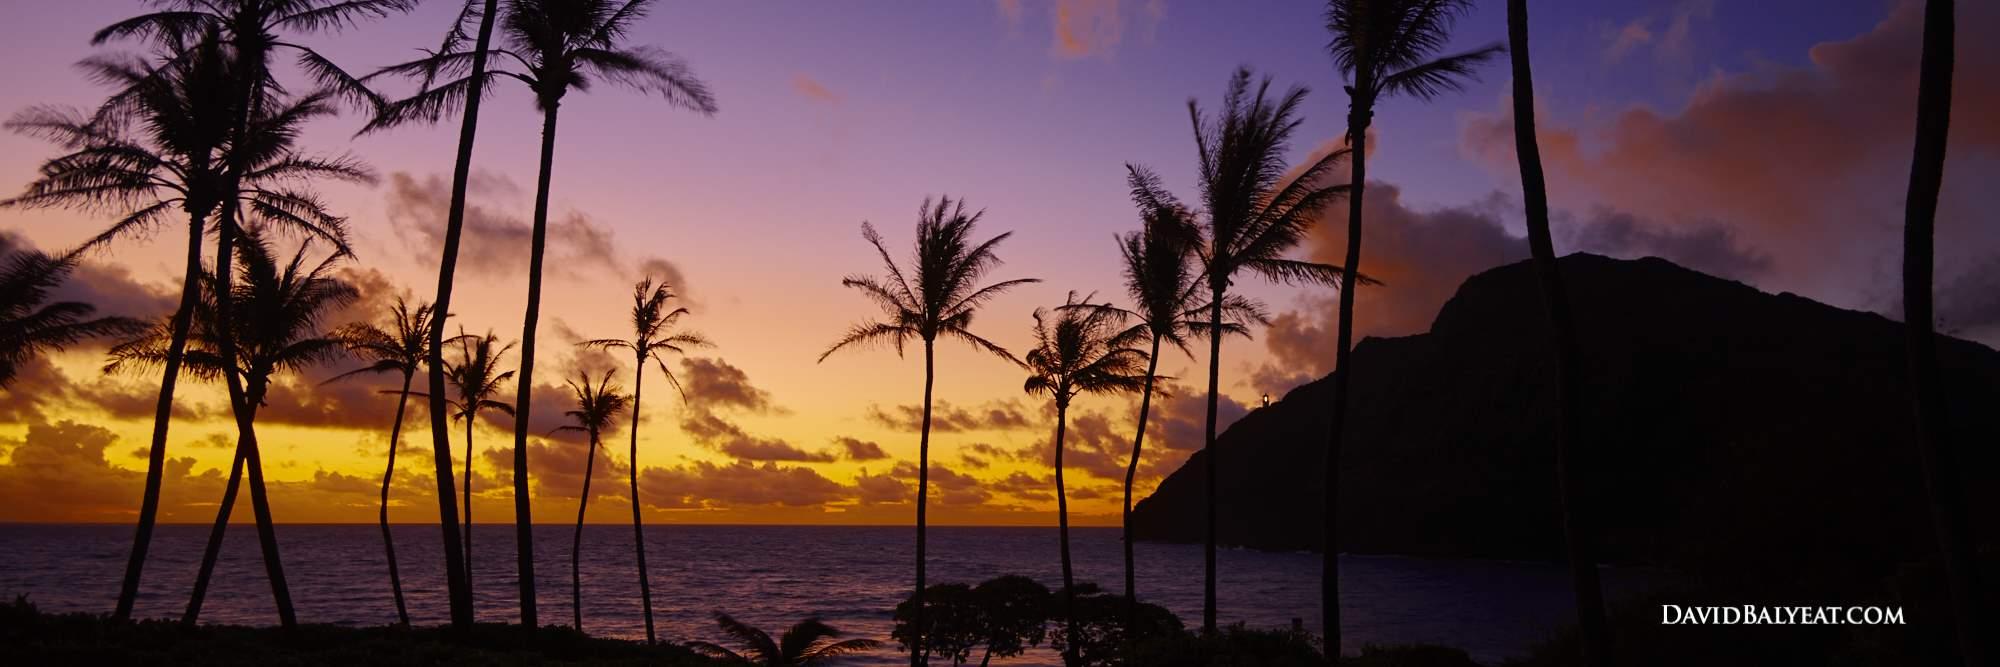 Hawaii David Balyeat Photography Portfolio